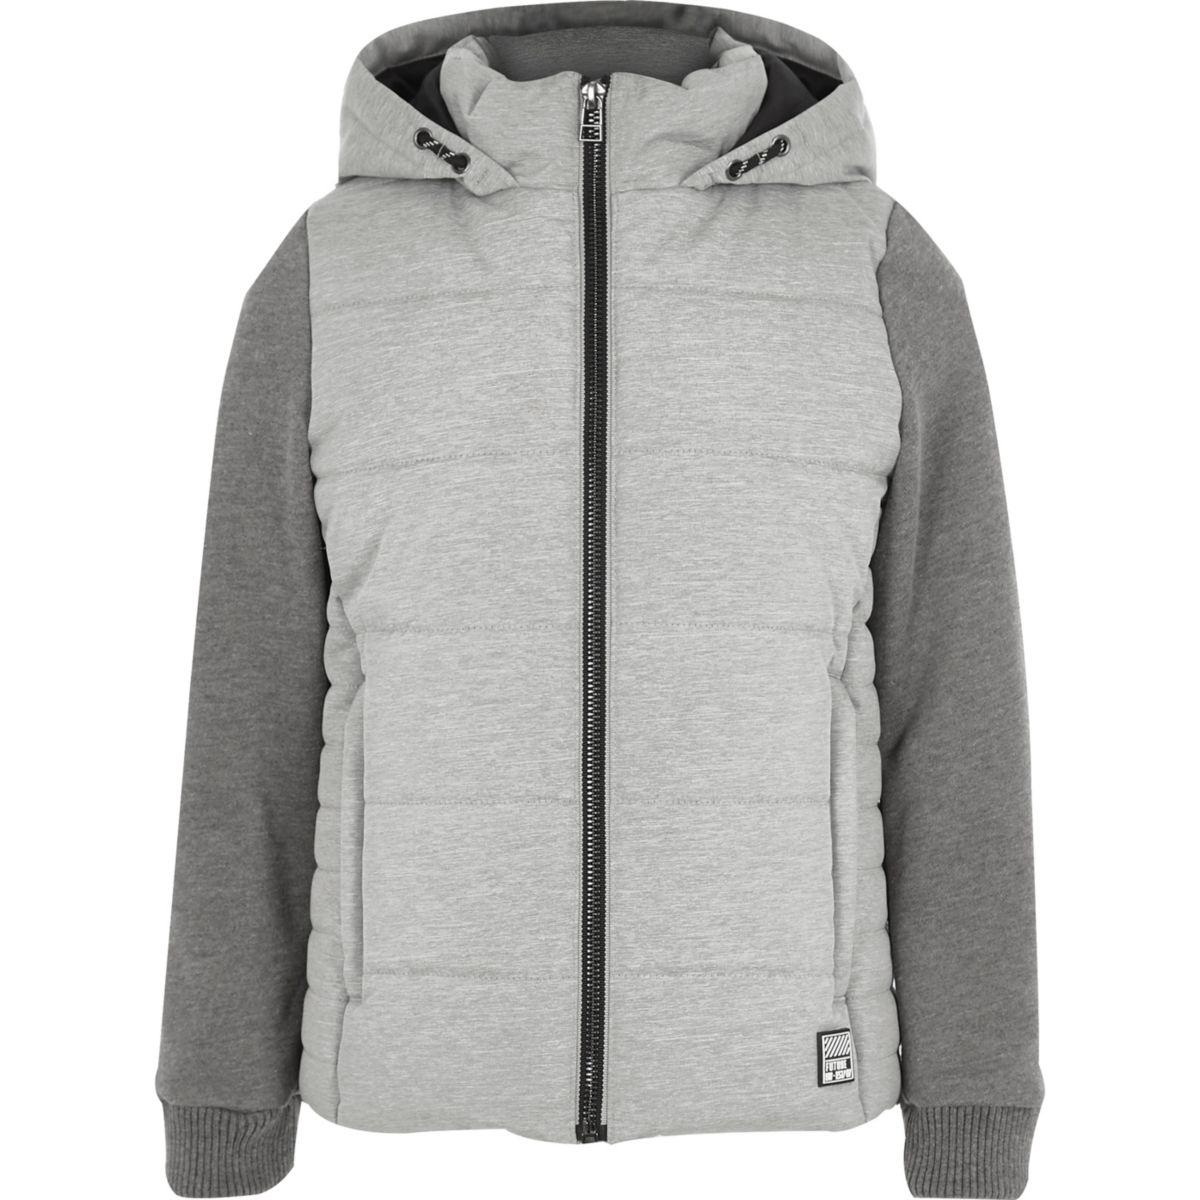 Boys grey puffer jersey sleeve hooded jacket